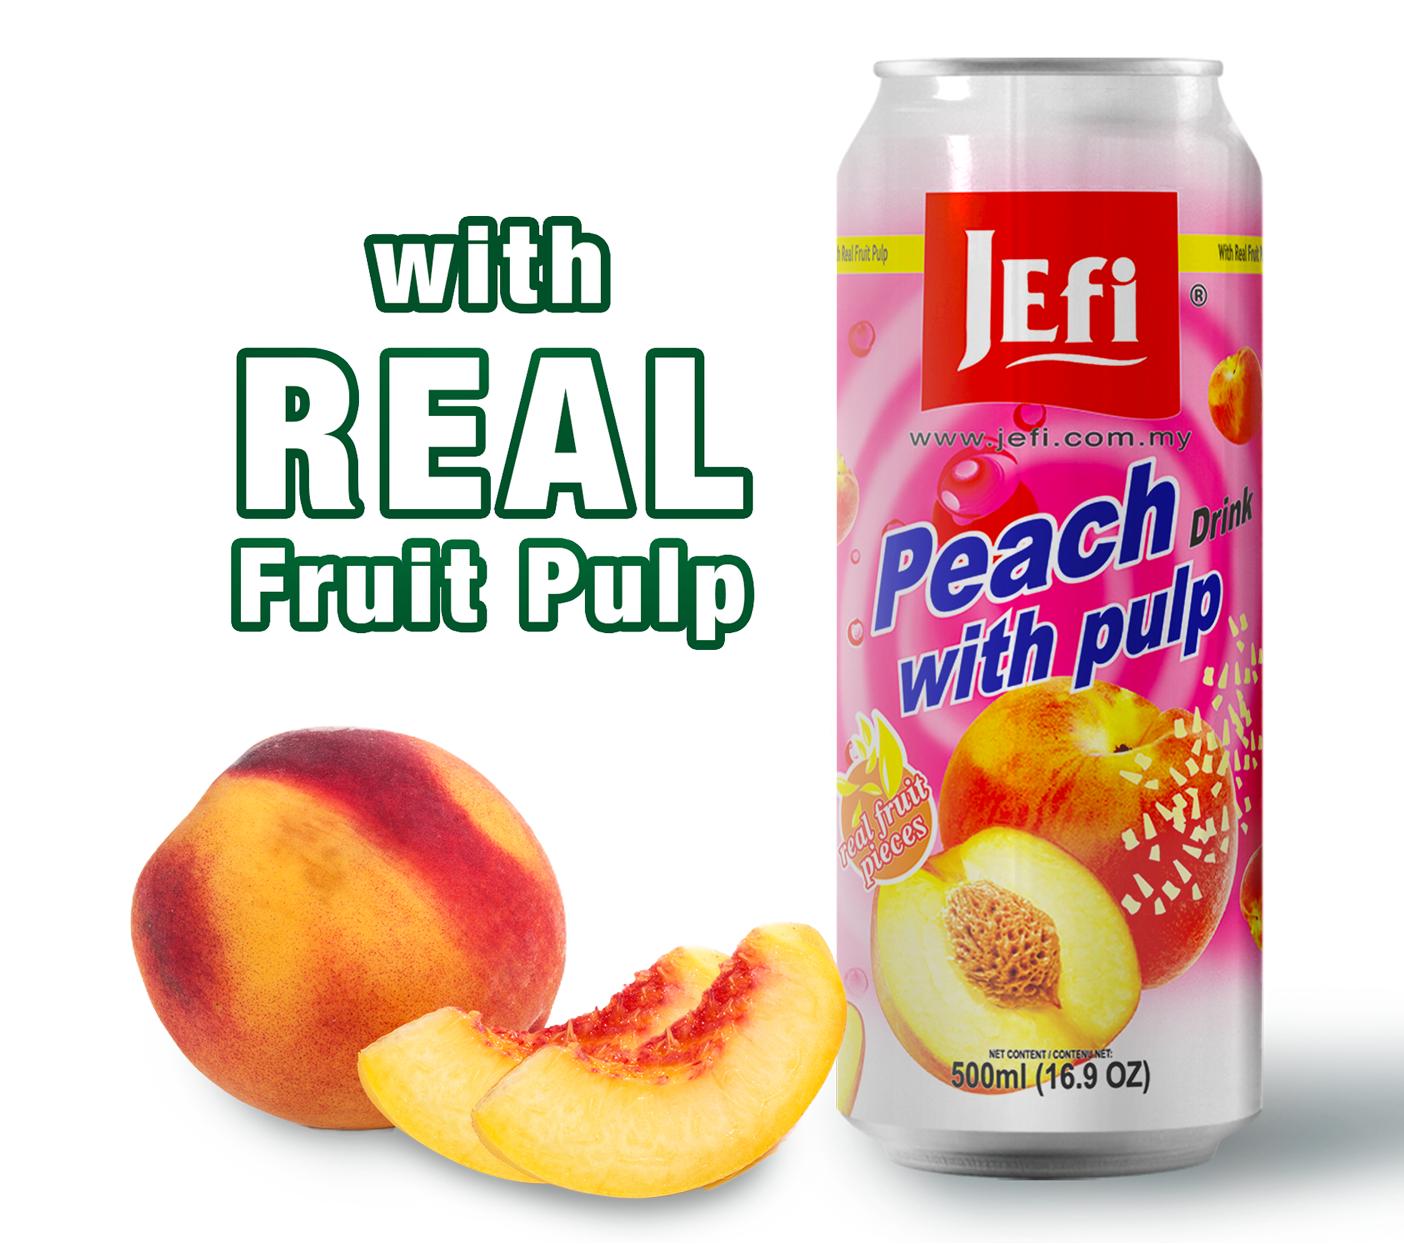 JEFI Peach Drinks with Real Fruit Pulp (500ml x 1tin)